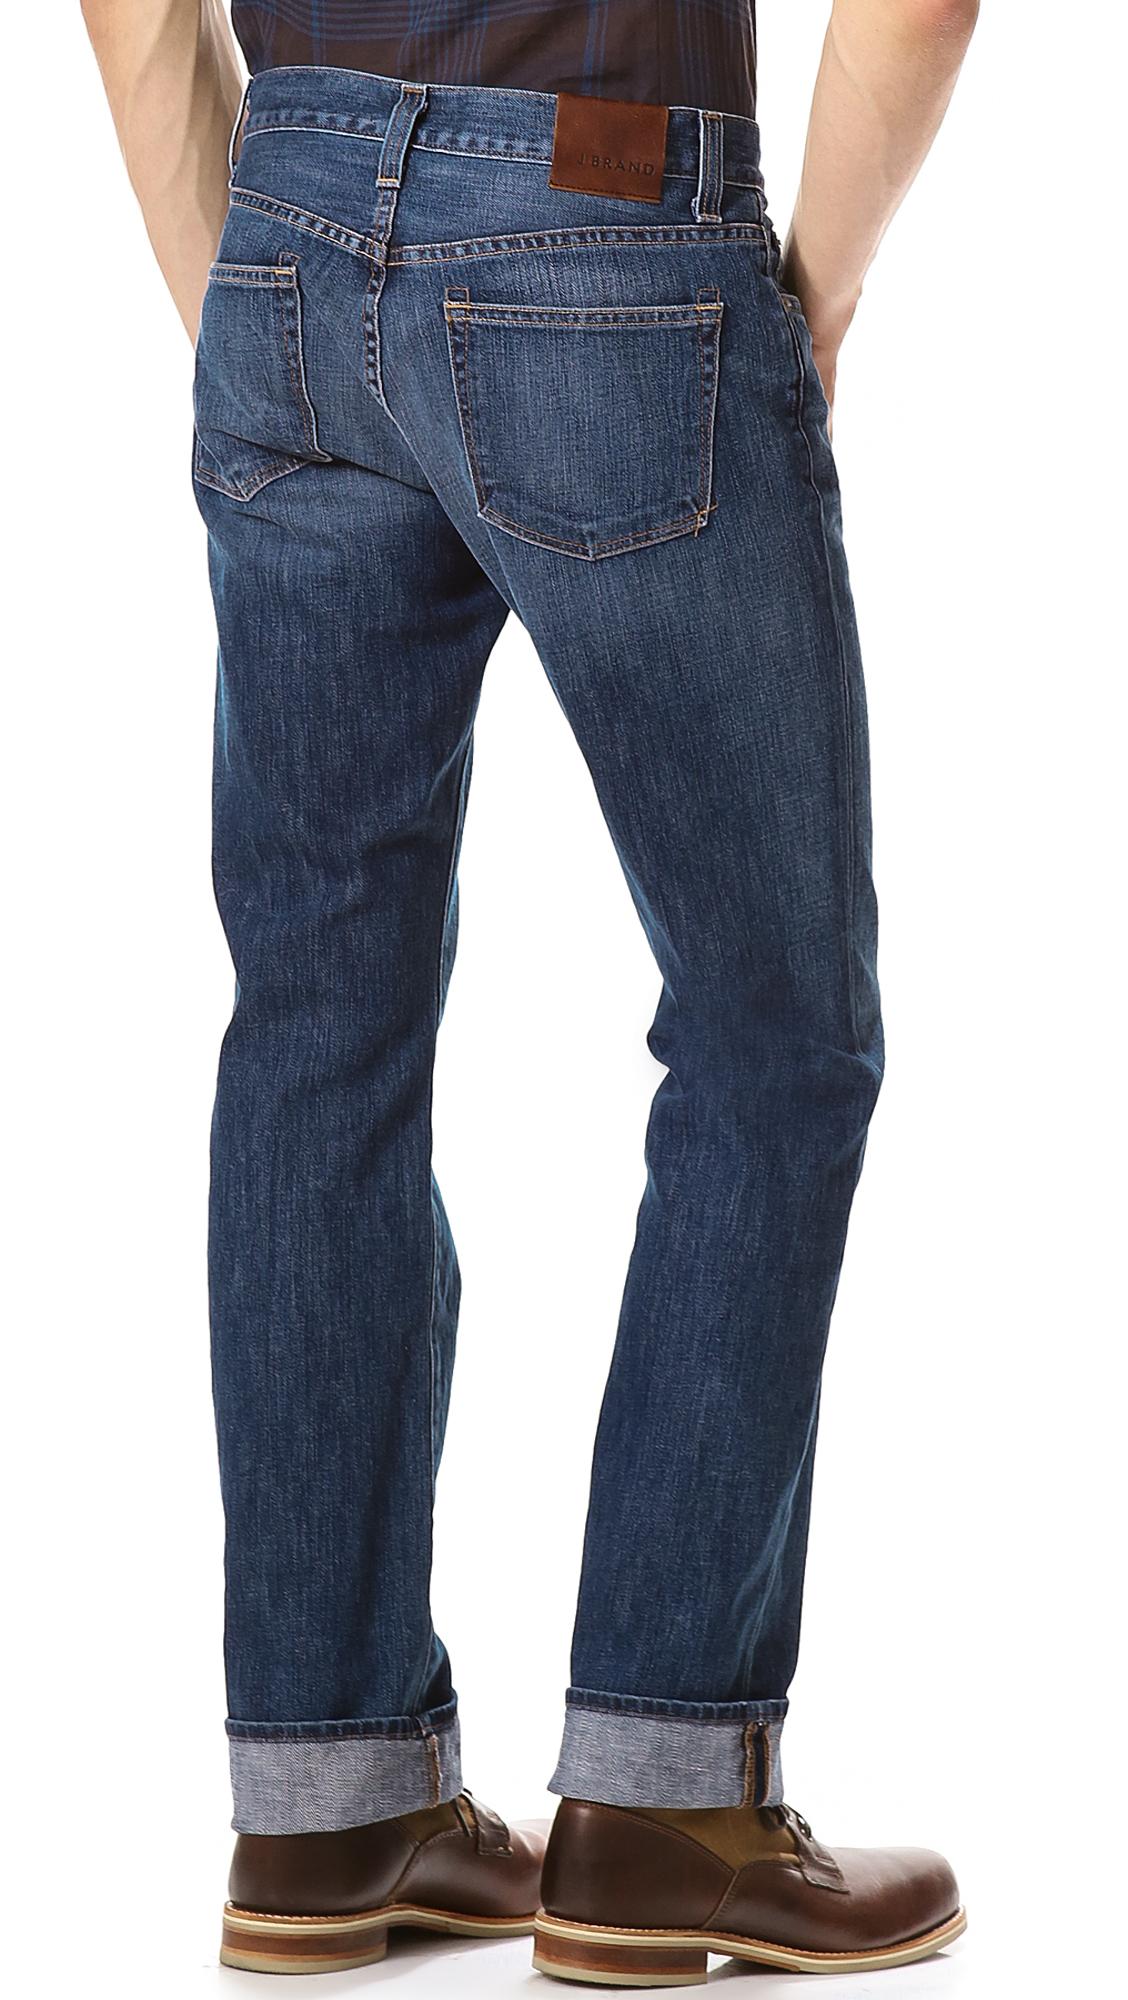 5431a791 Darren Covet 12oz Jeans